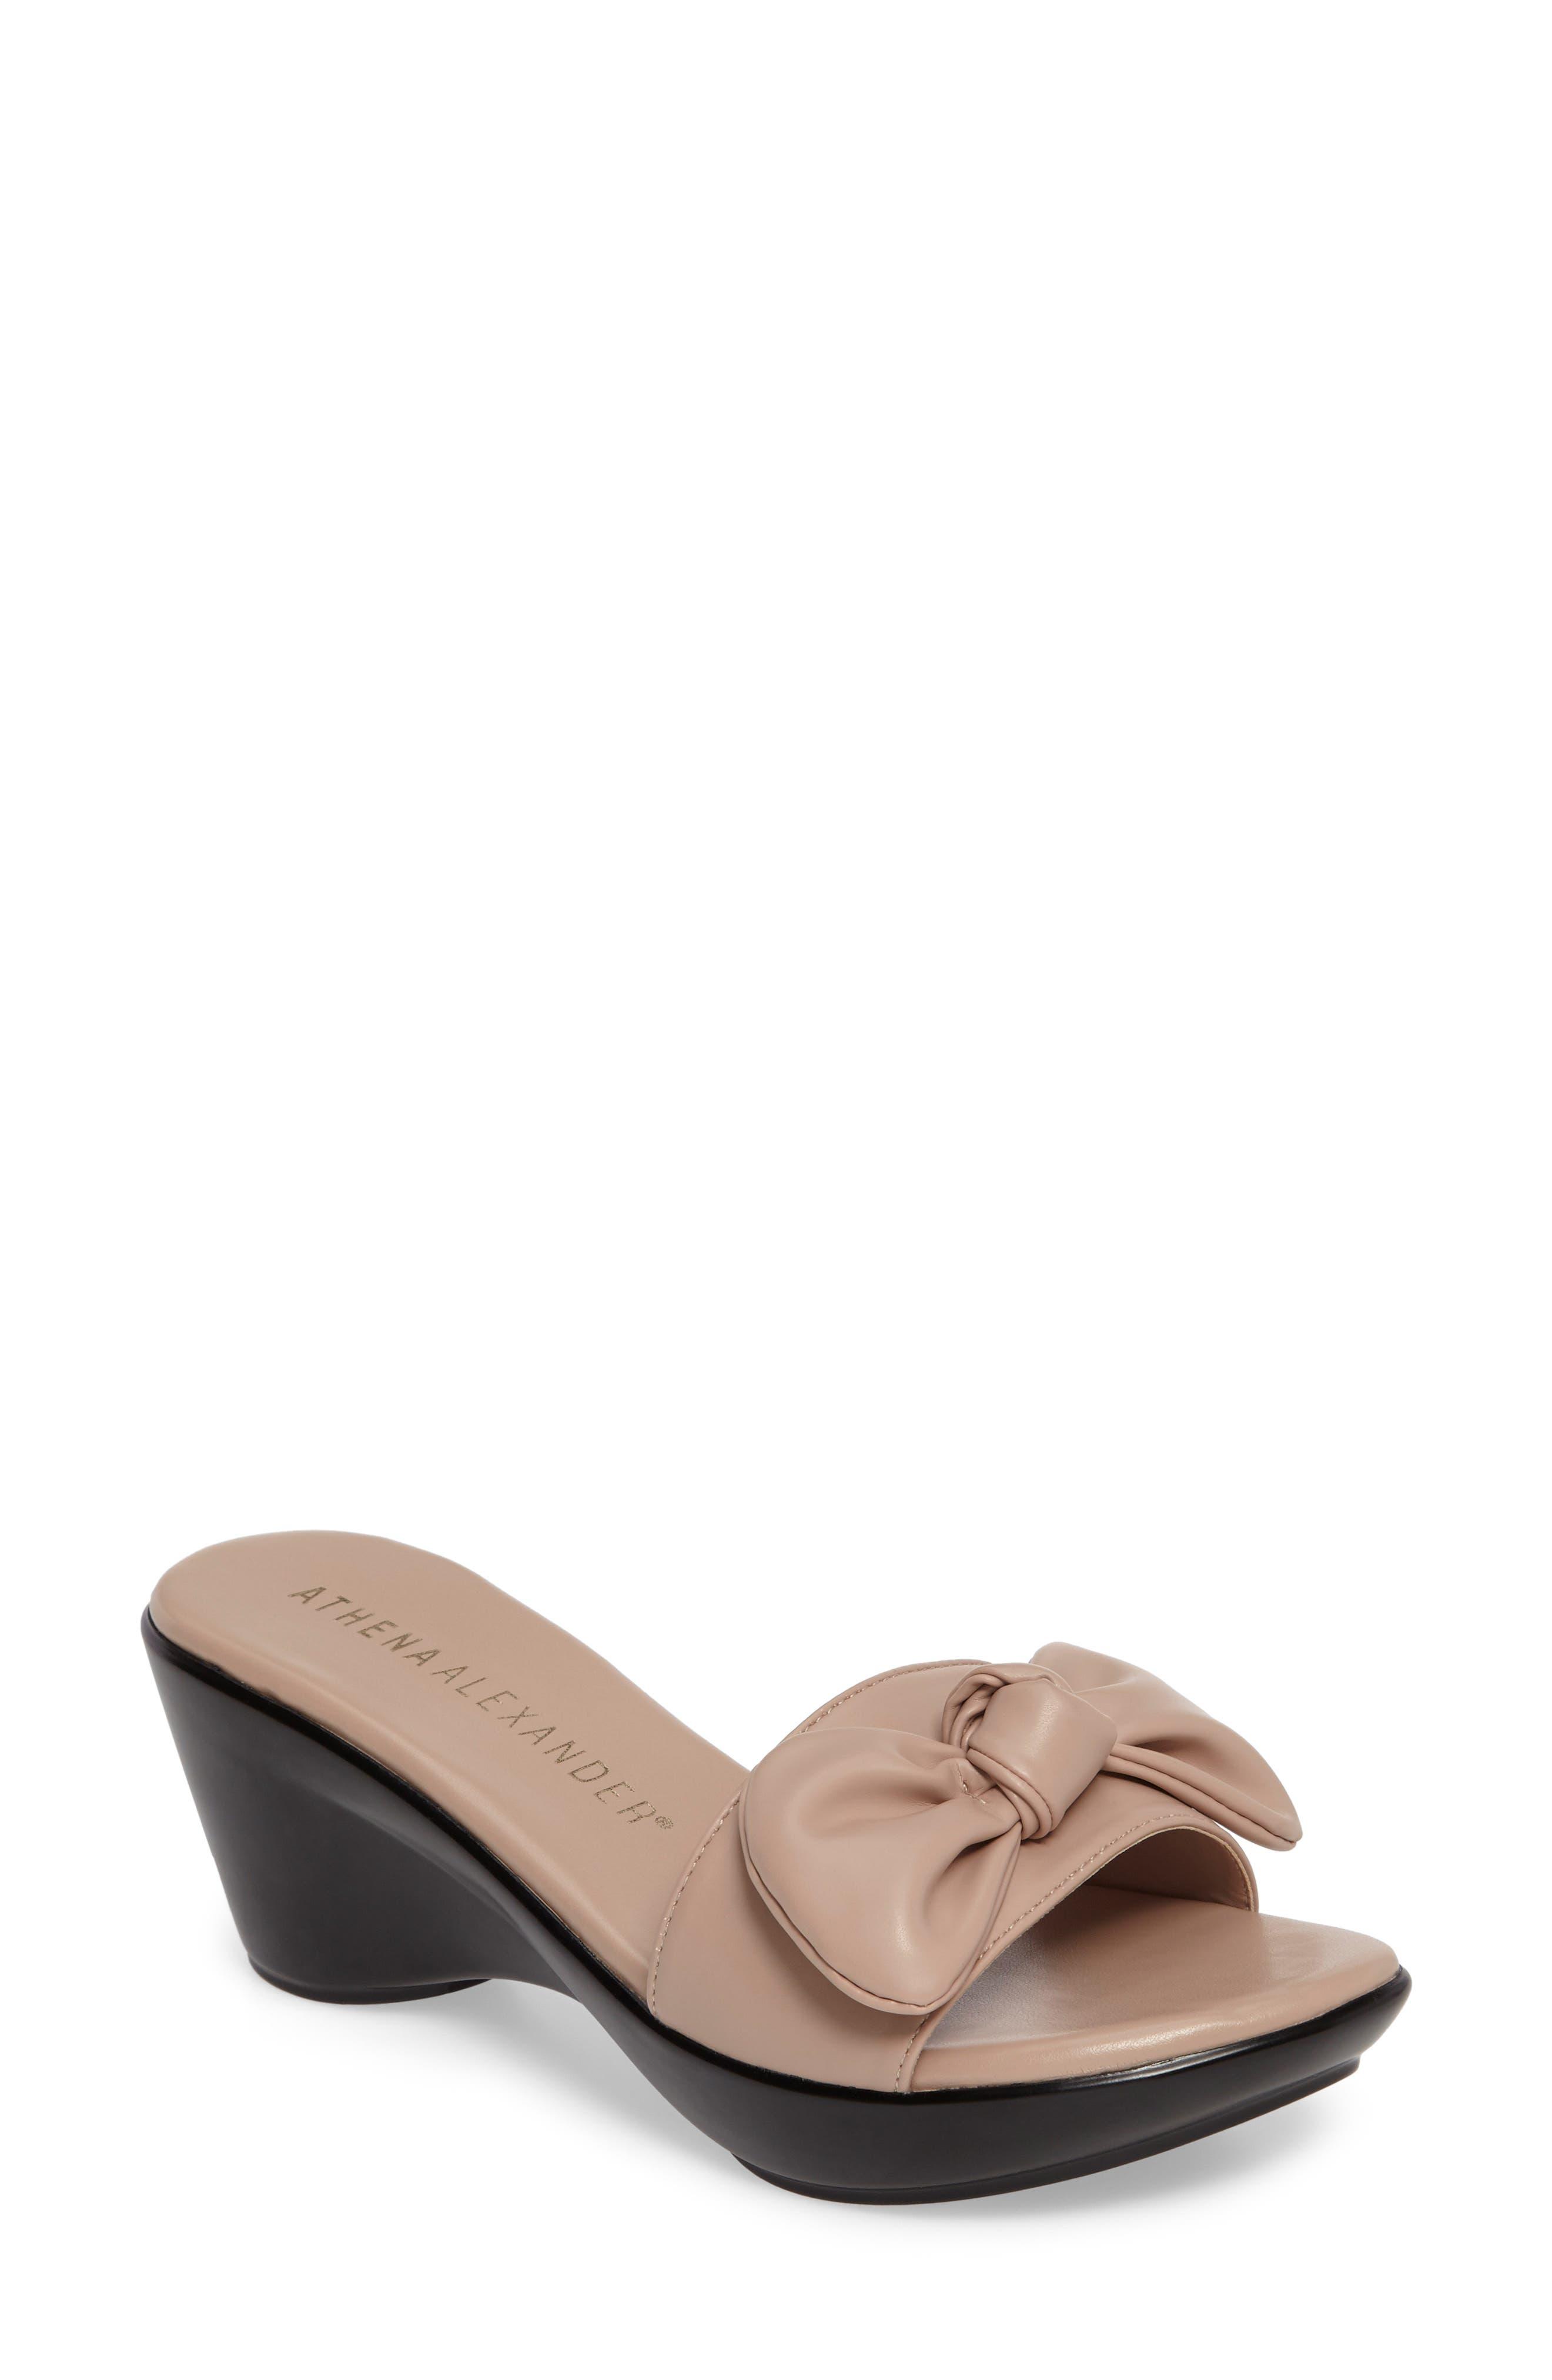 Pattye Knotted Slide Sandal,                         Main,                         color, Blush Faux Leather